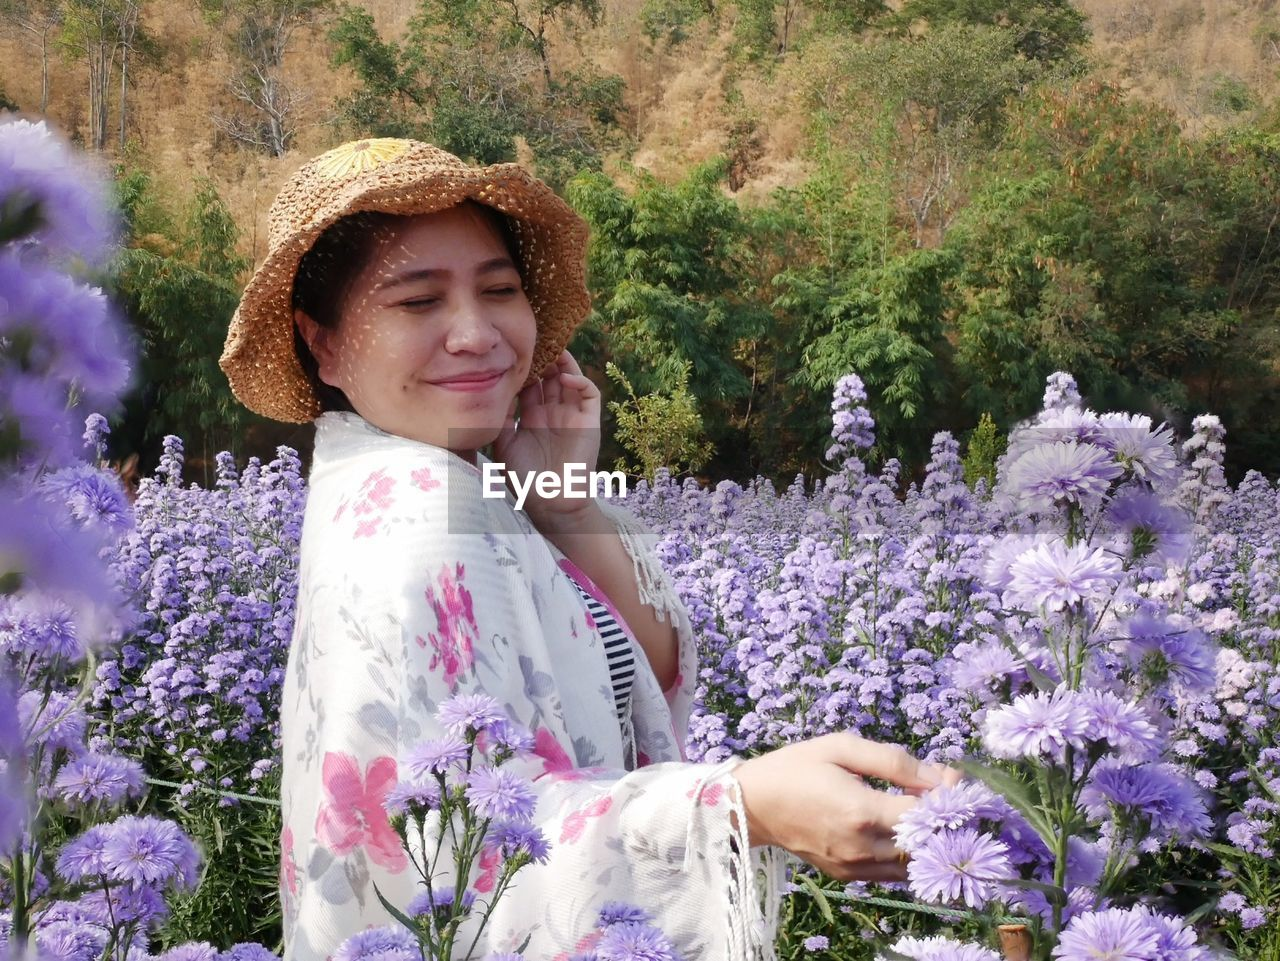 HAPPY WOMAN STANDING ON PURPLE FLOWERING PLANTS